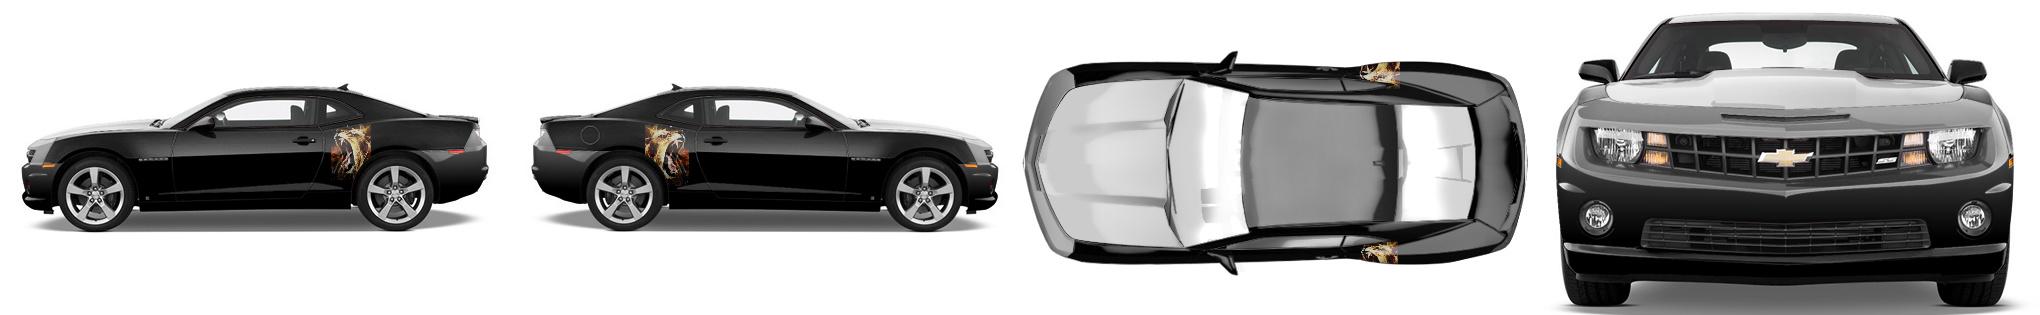 Muscle Car Wrap #52876